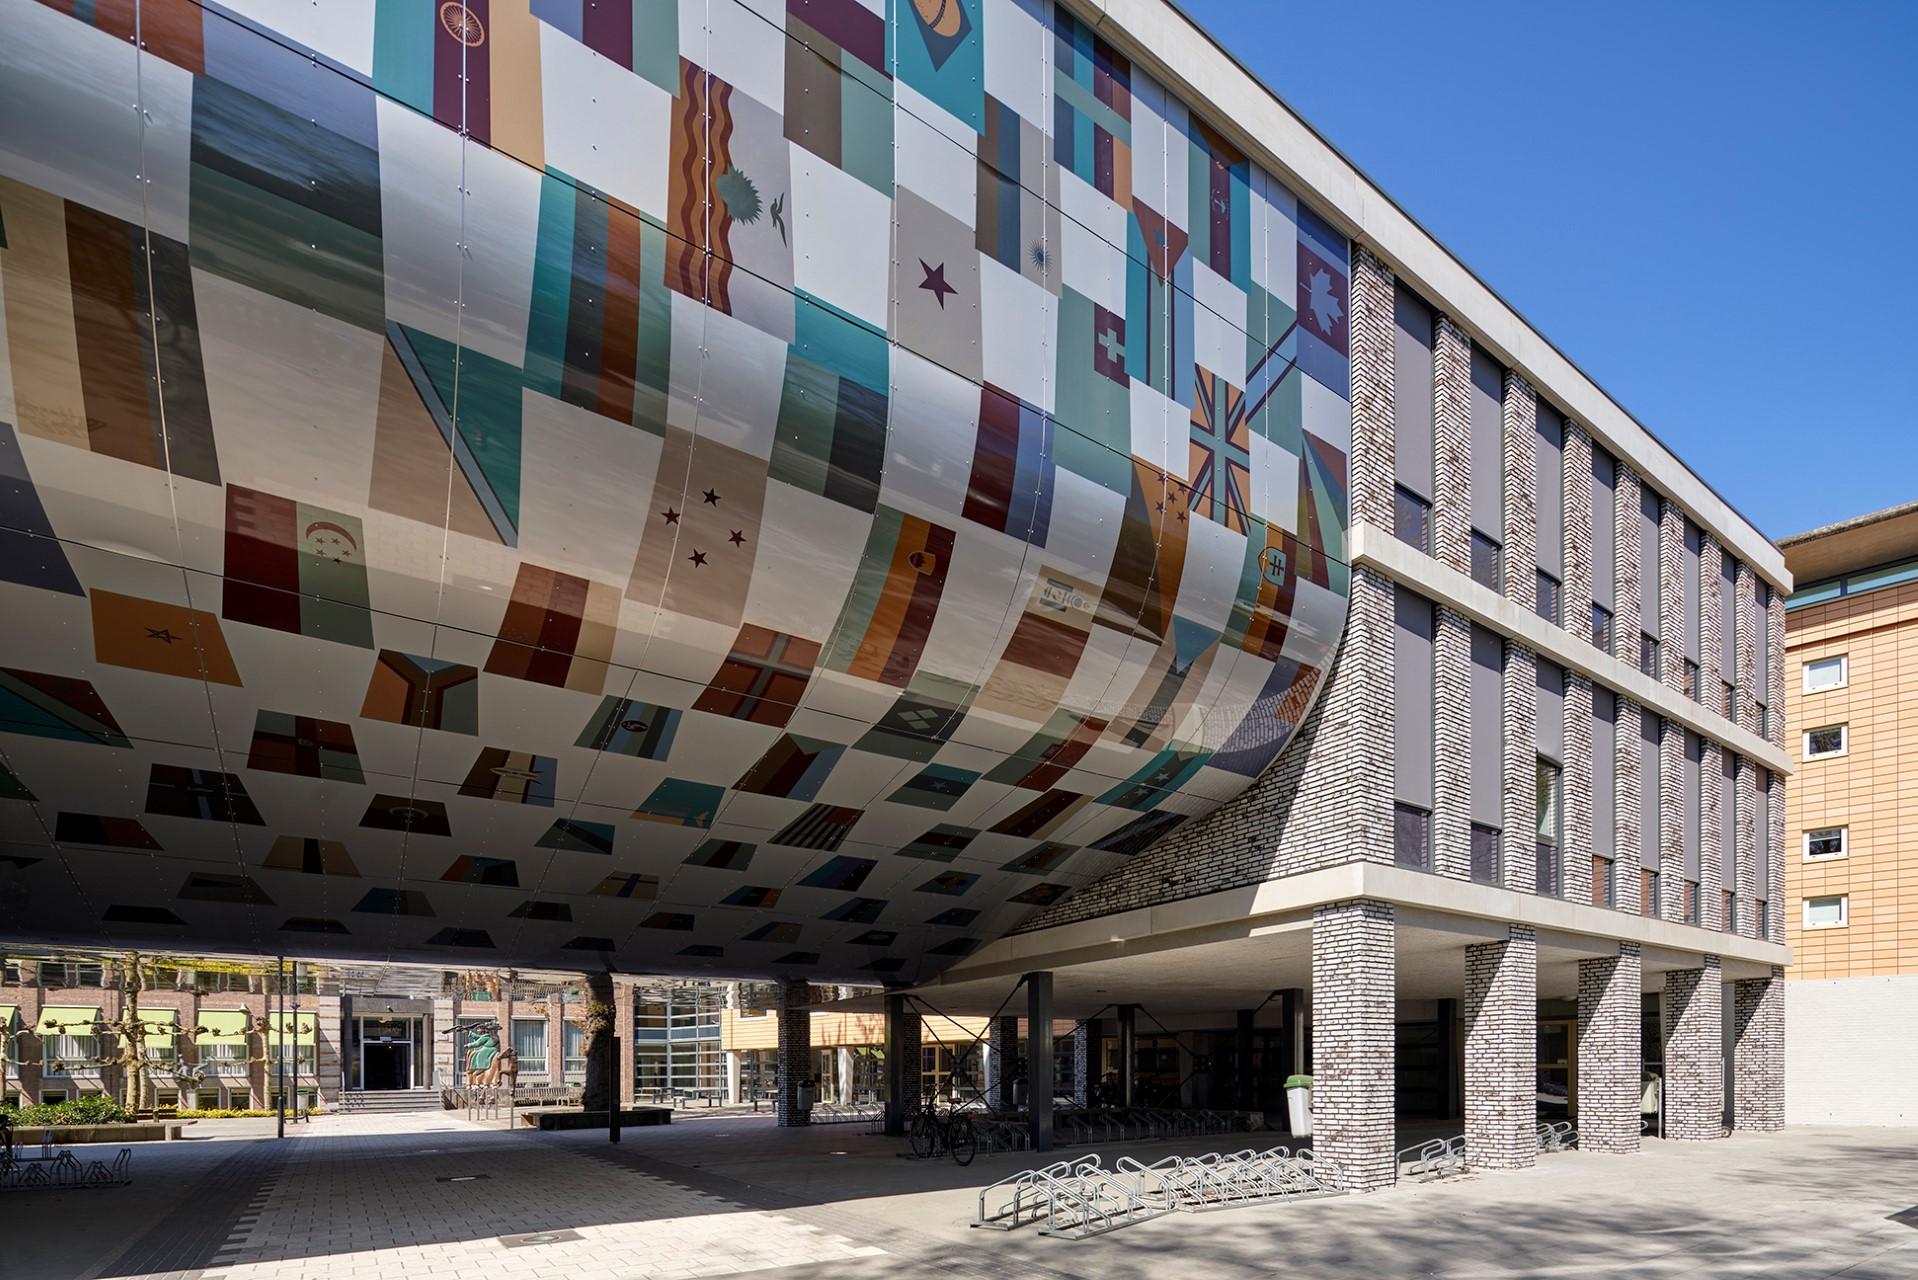 MD Flack gevelbekleding zijkant International Campus Breda